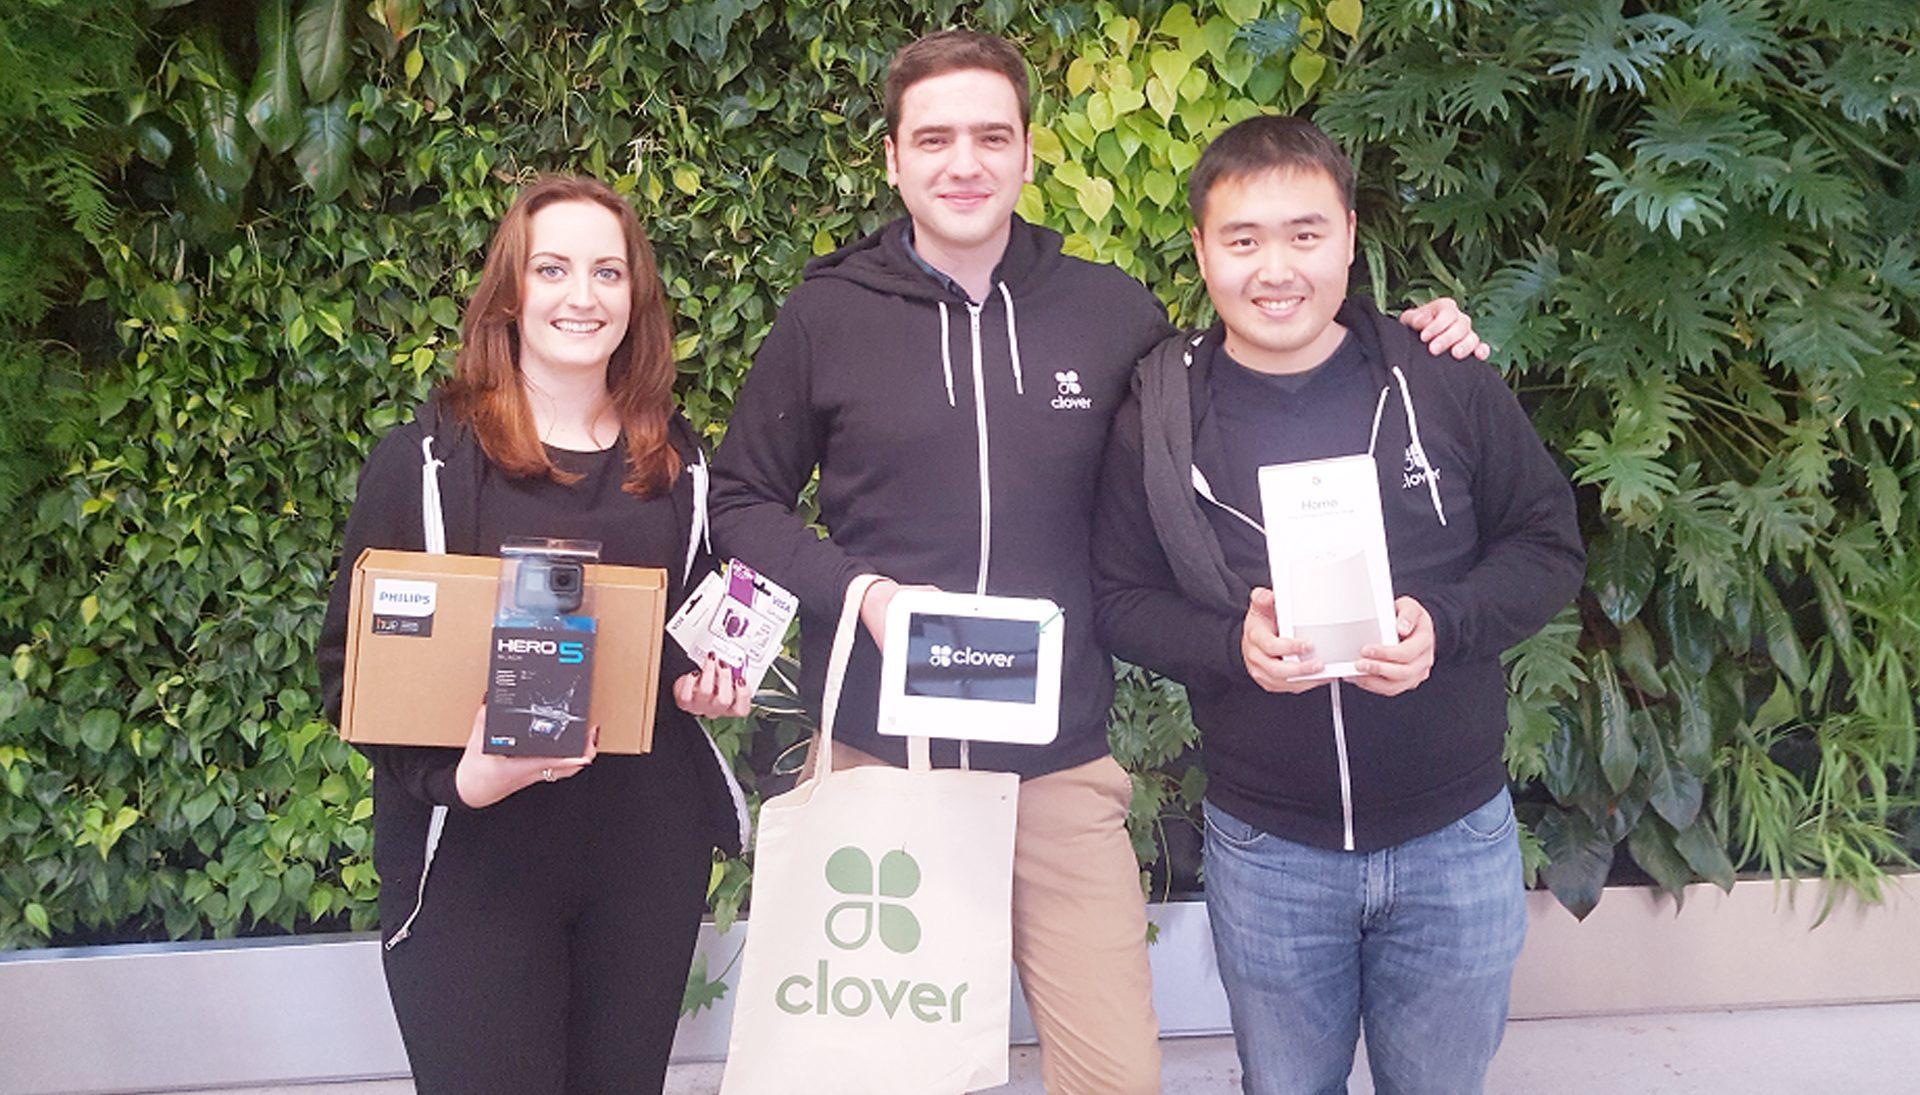 Philippa Christie, her boyfriend Dan Chapman and Qi, their colleague.